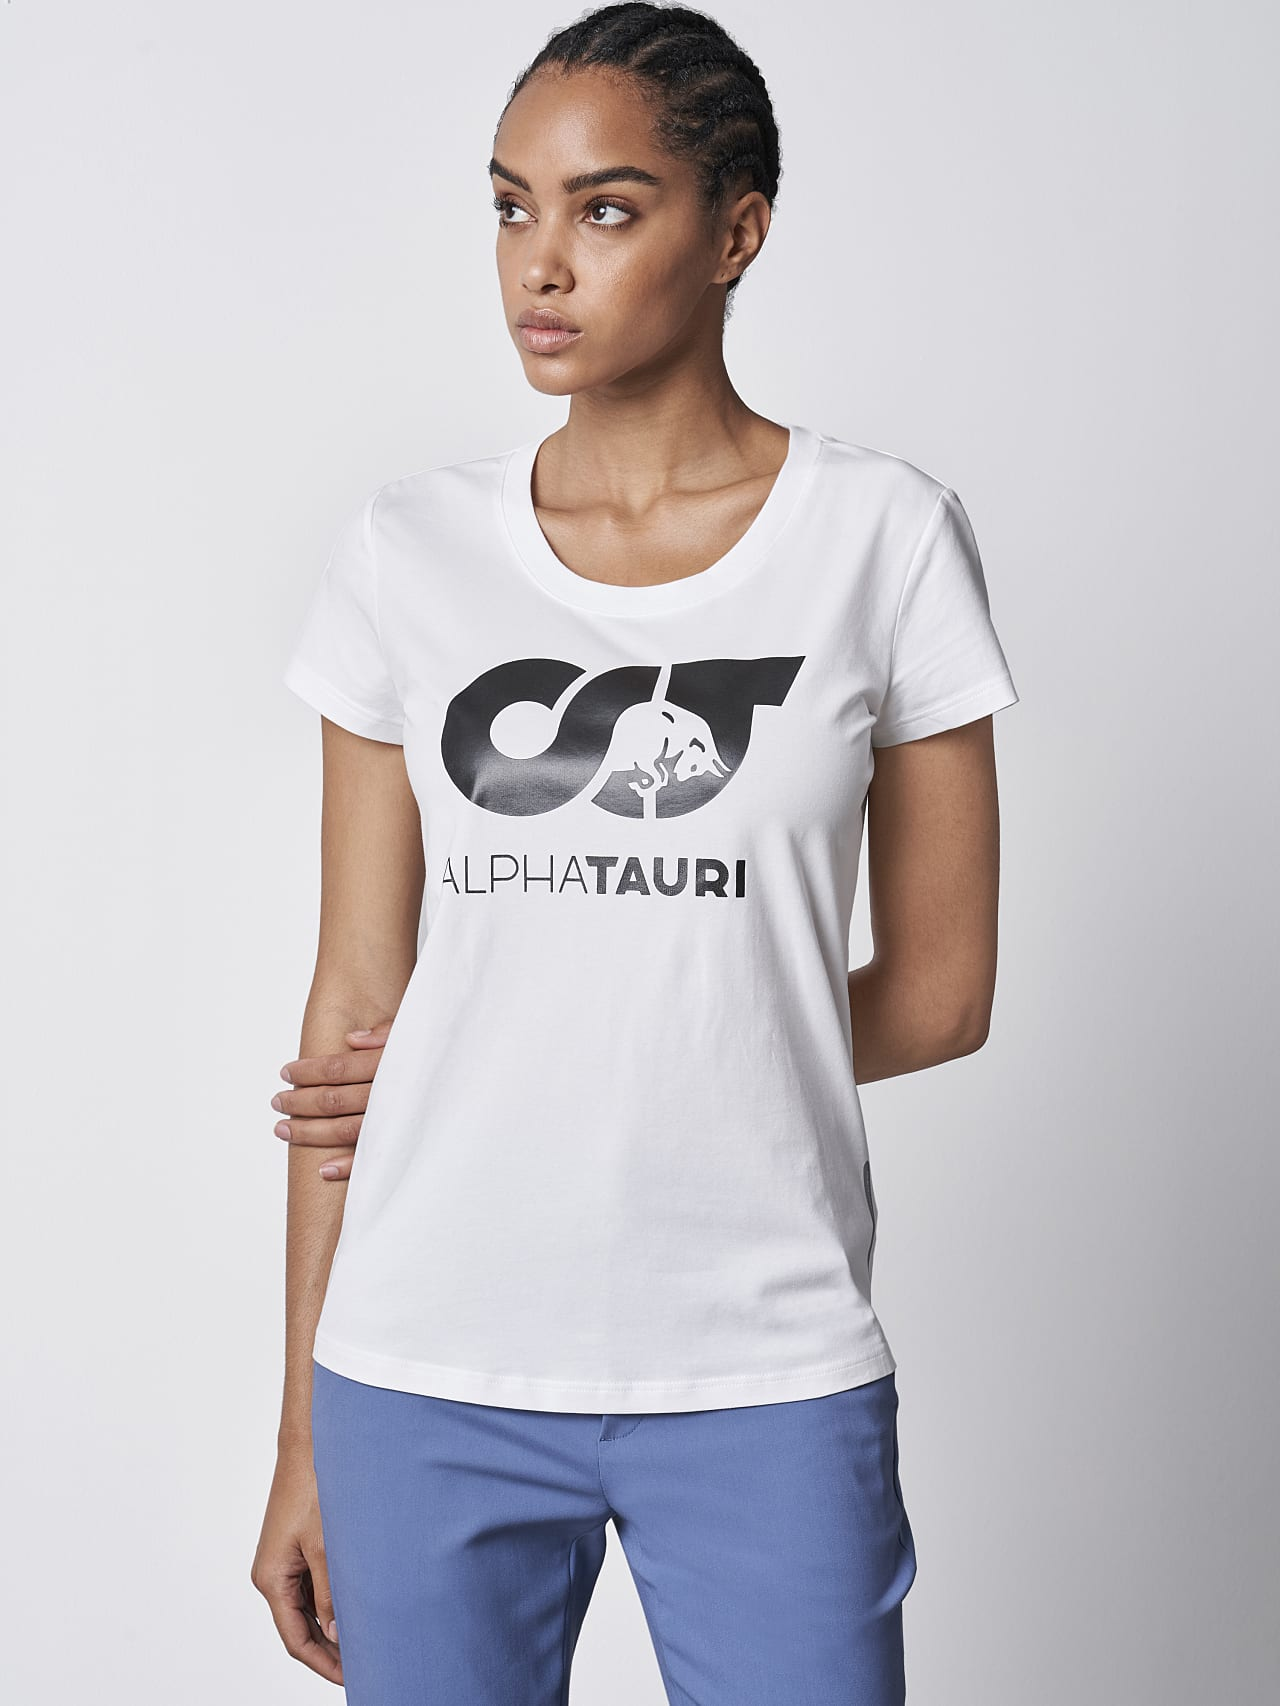 JERU V2.Y4.02 Signature Logo T-Shirt white Model shot Alpha Tauri